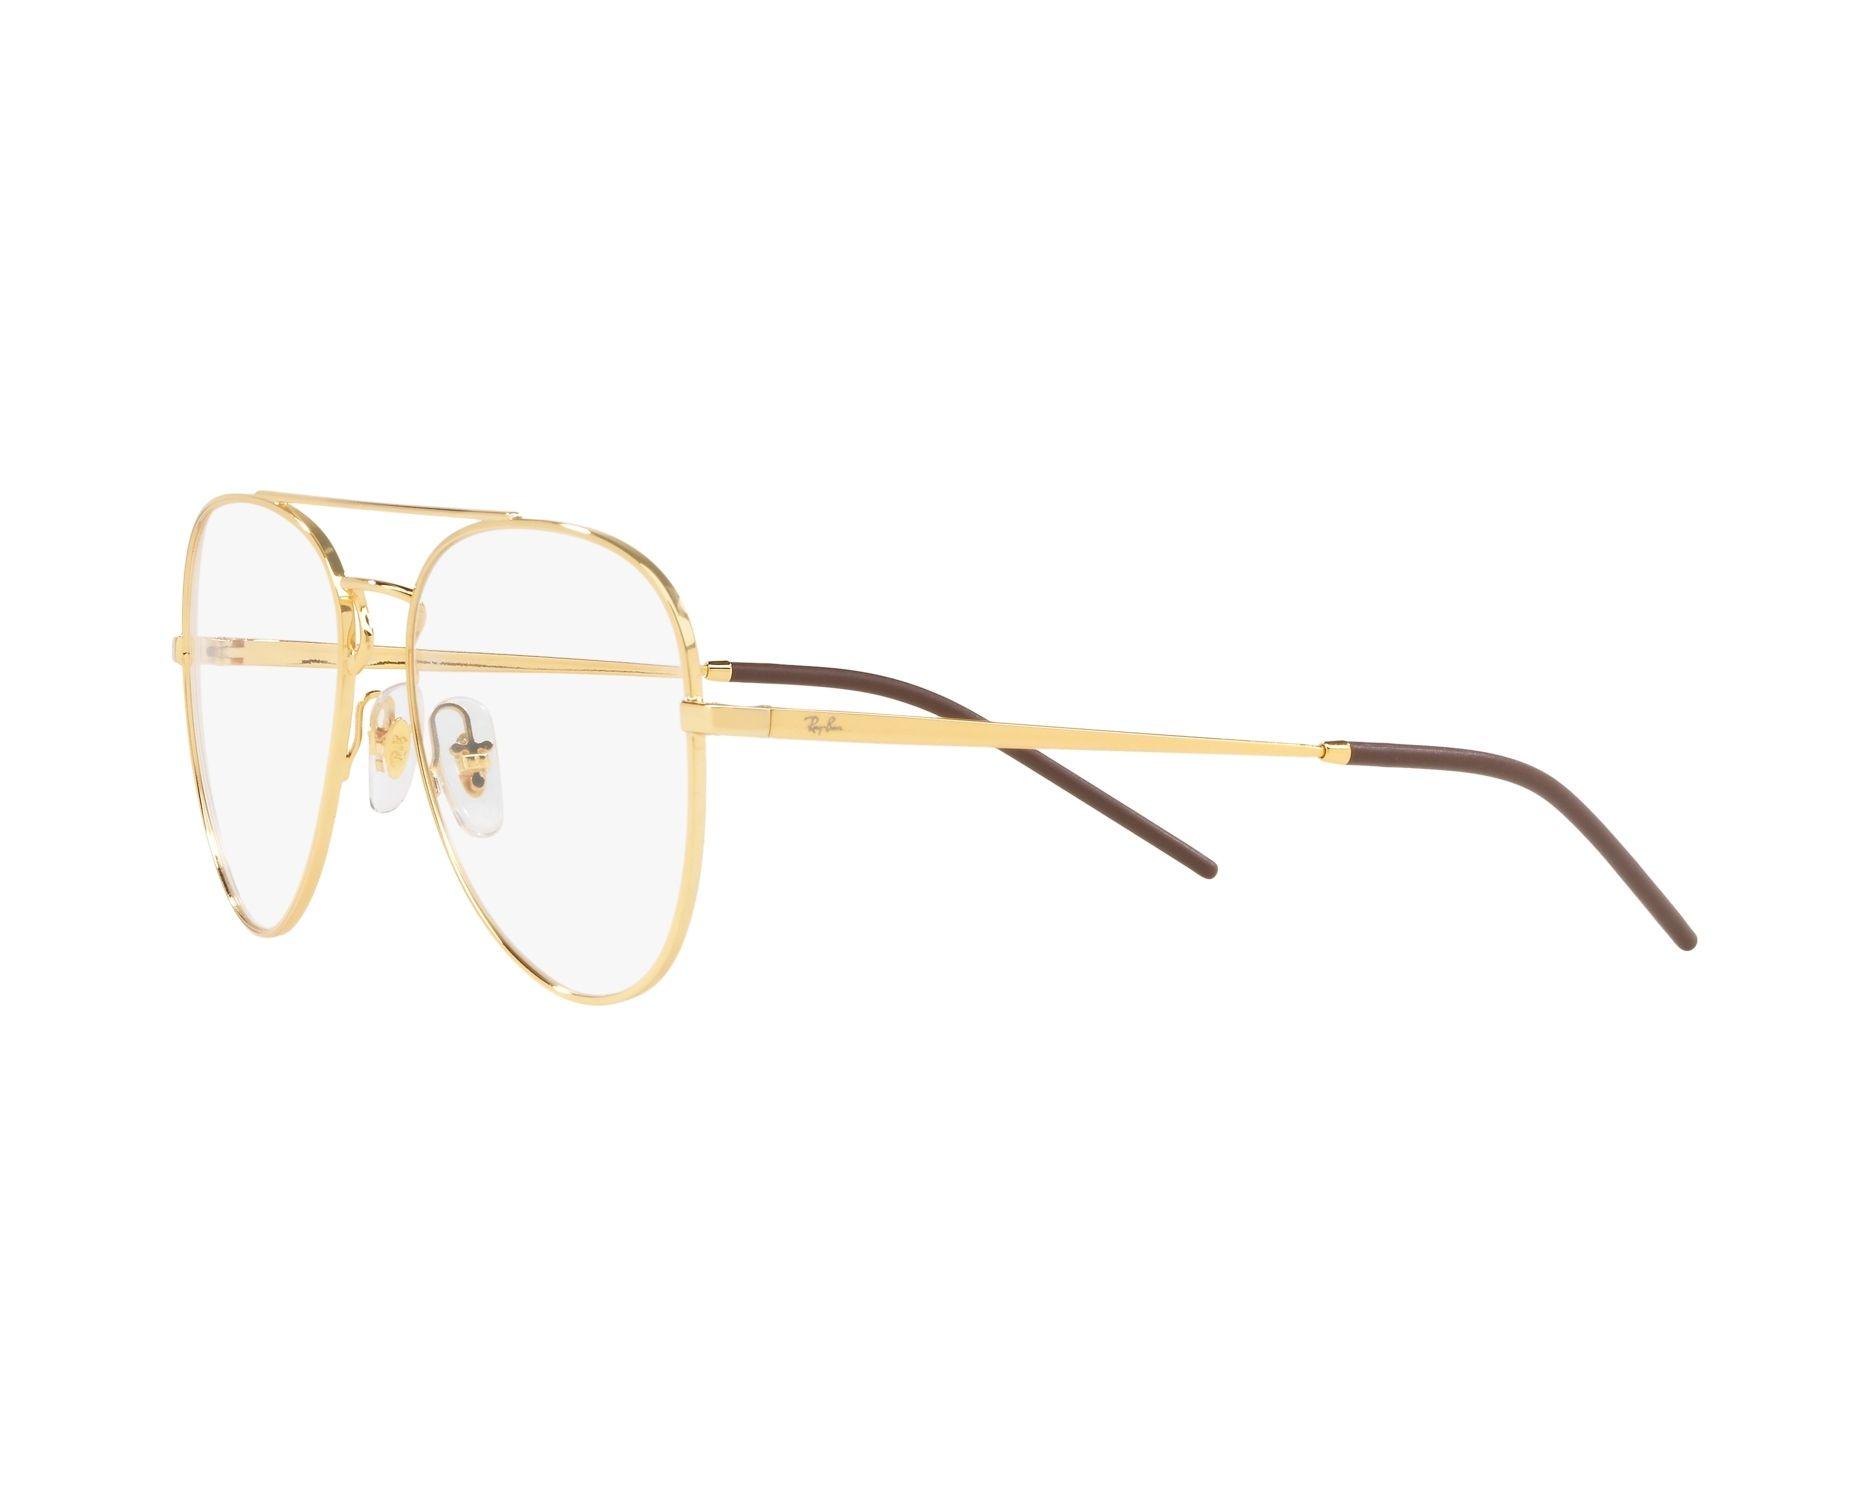 56a6b205e24 eyeglasses Ray-Ban RX-6413 2500 54-17 Gold 360 degree view 3